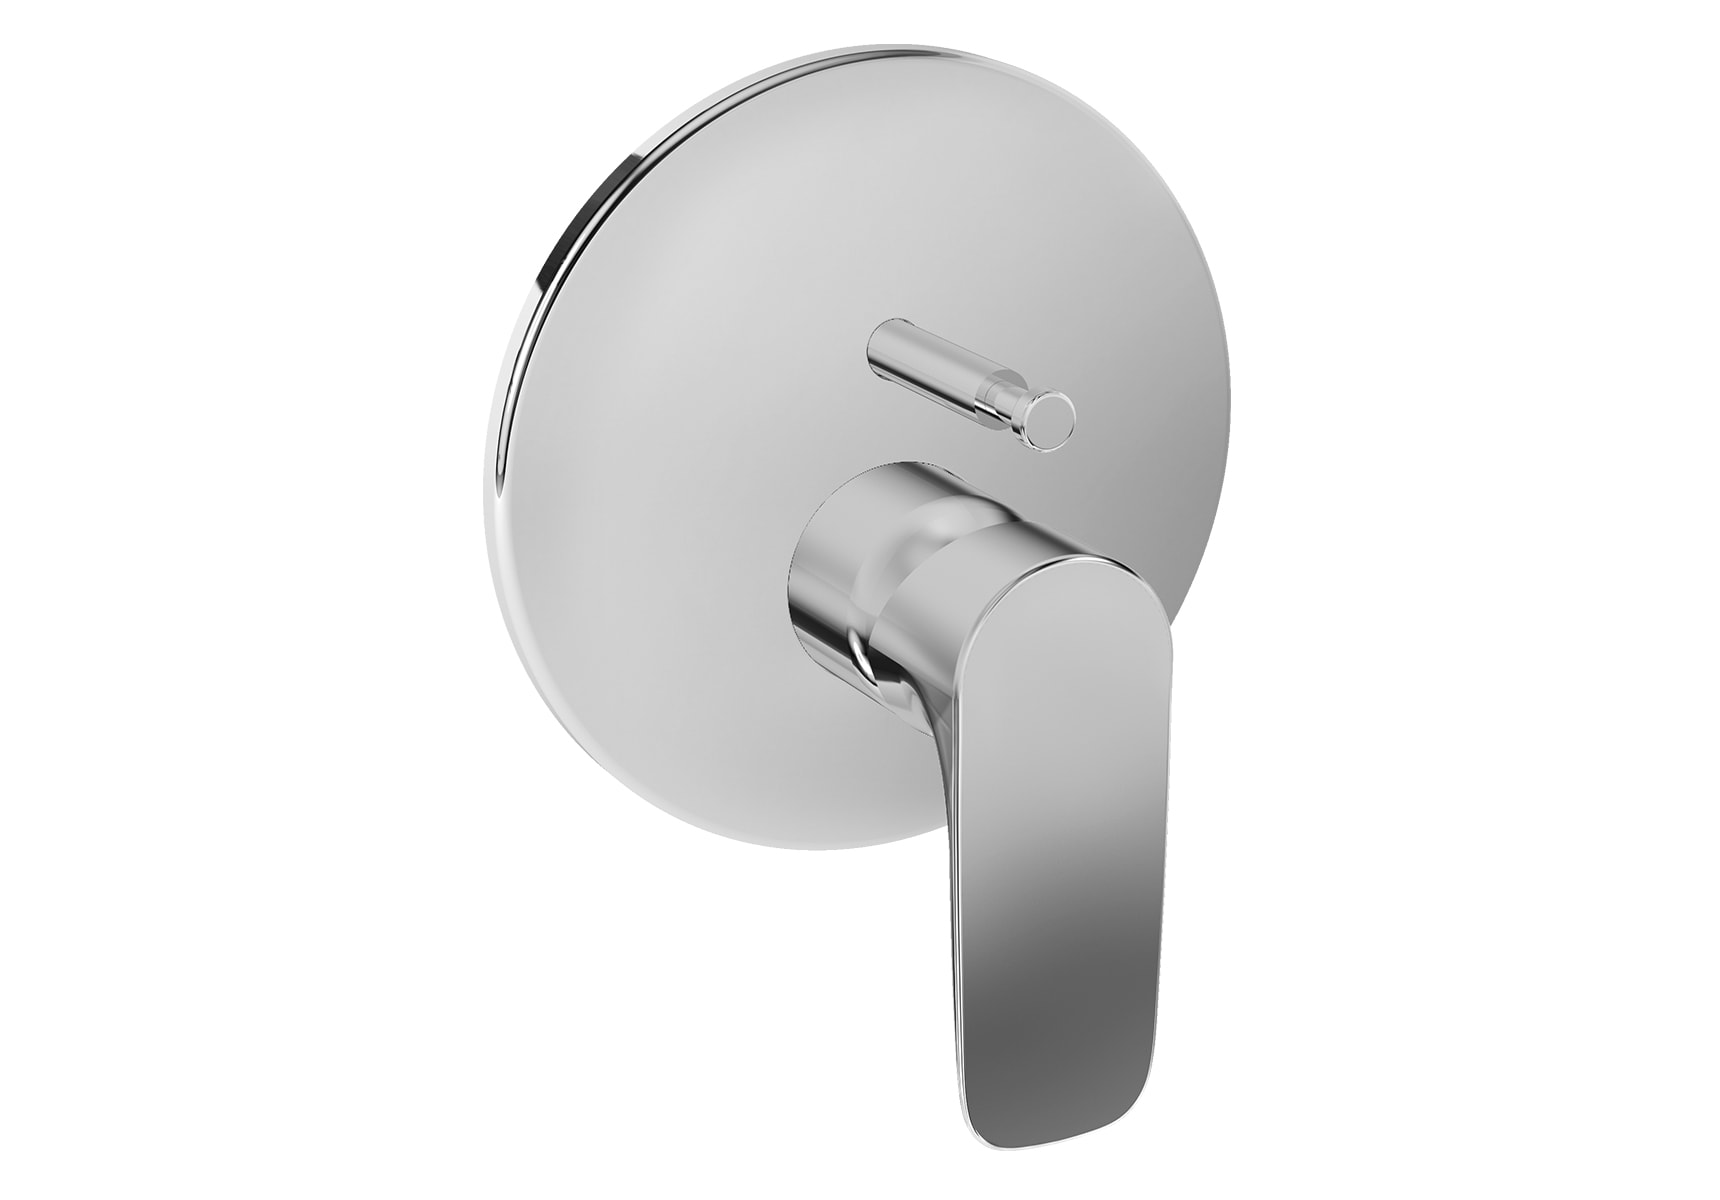 X-Line Built-In Bath/Shower Mixer, V-Box-Exposed Part, Chrome